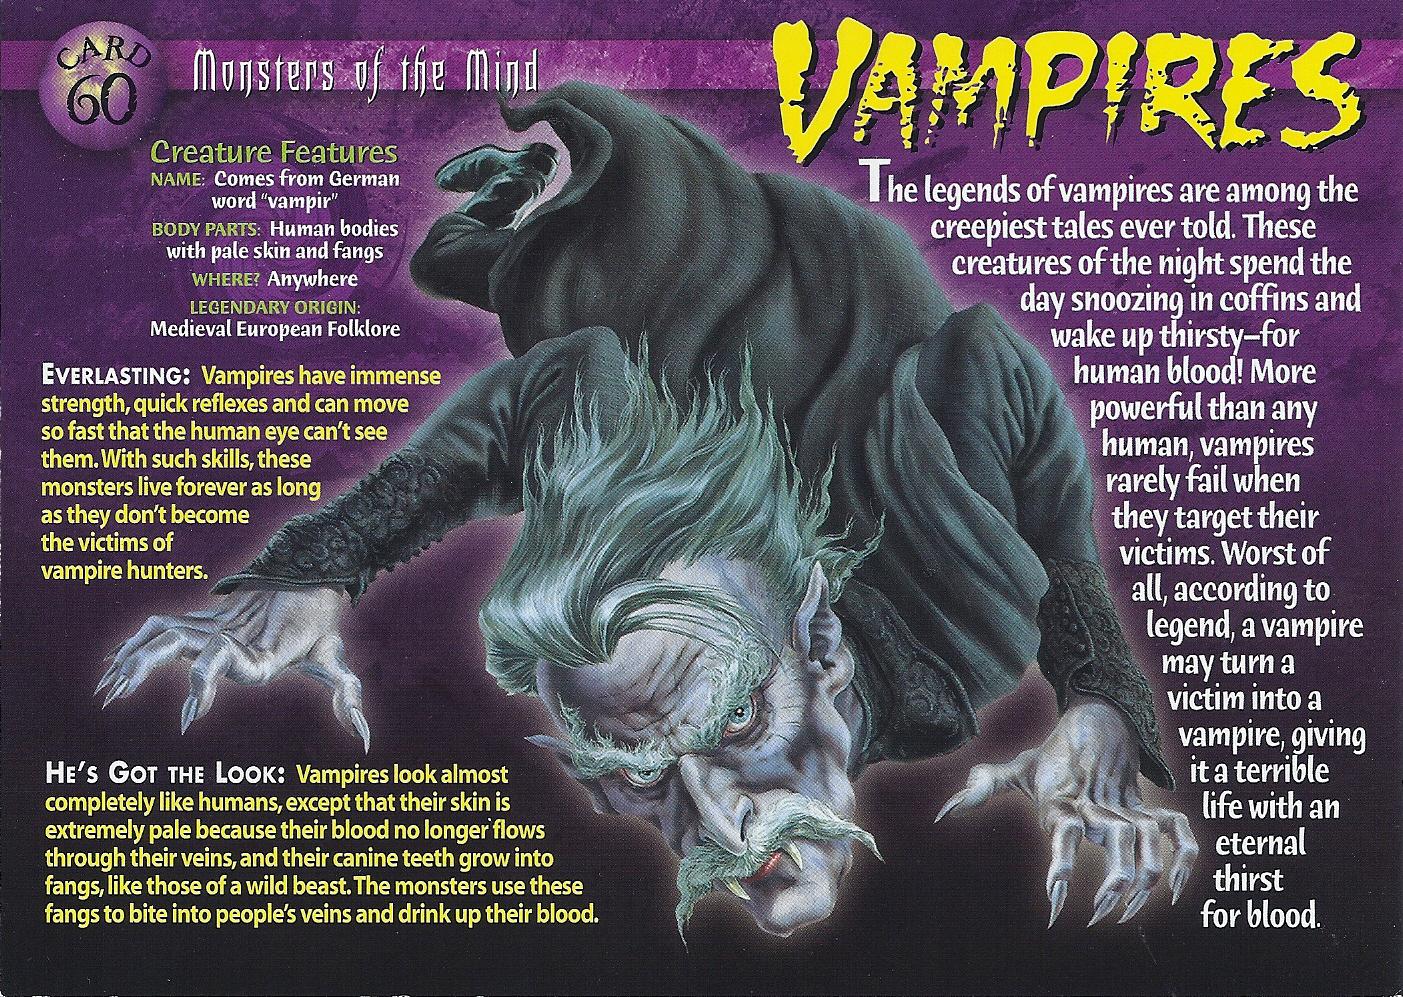 Lost Tapes Vampire